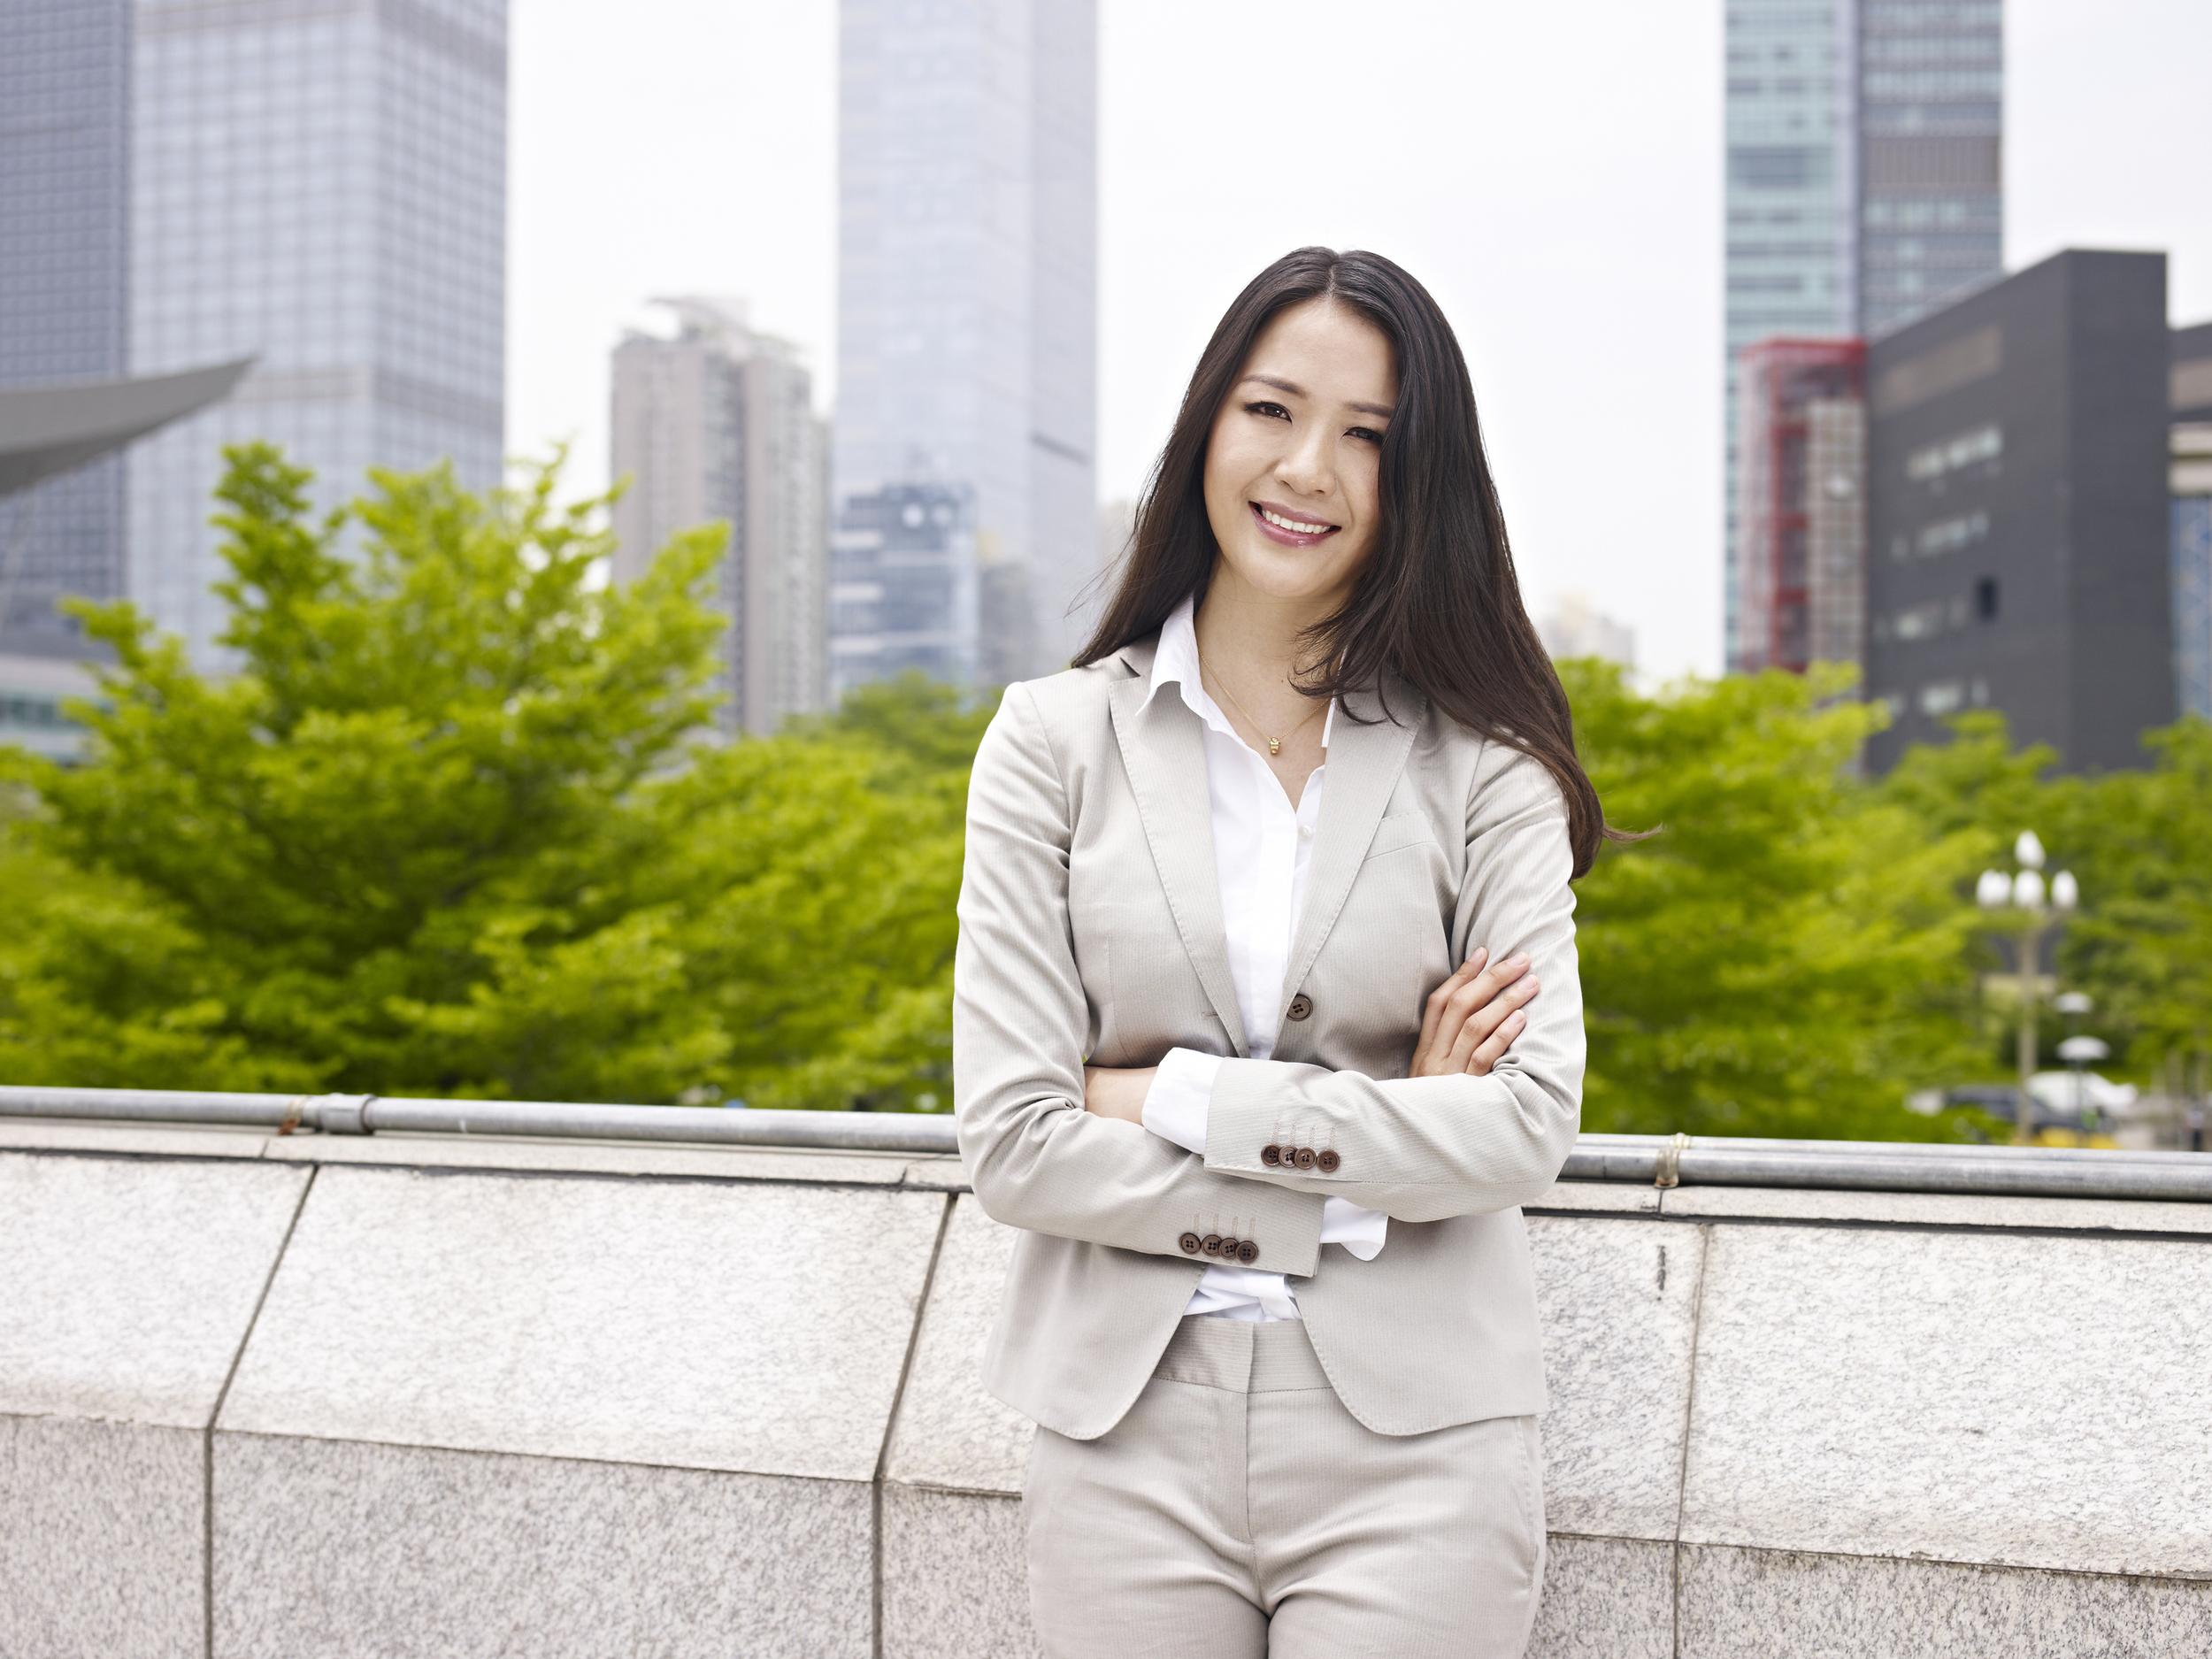 bigstock-Young-Businesswoman-70622032.jpg